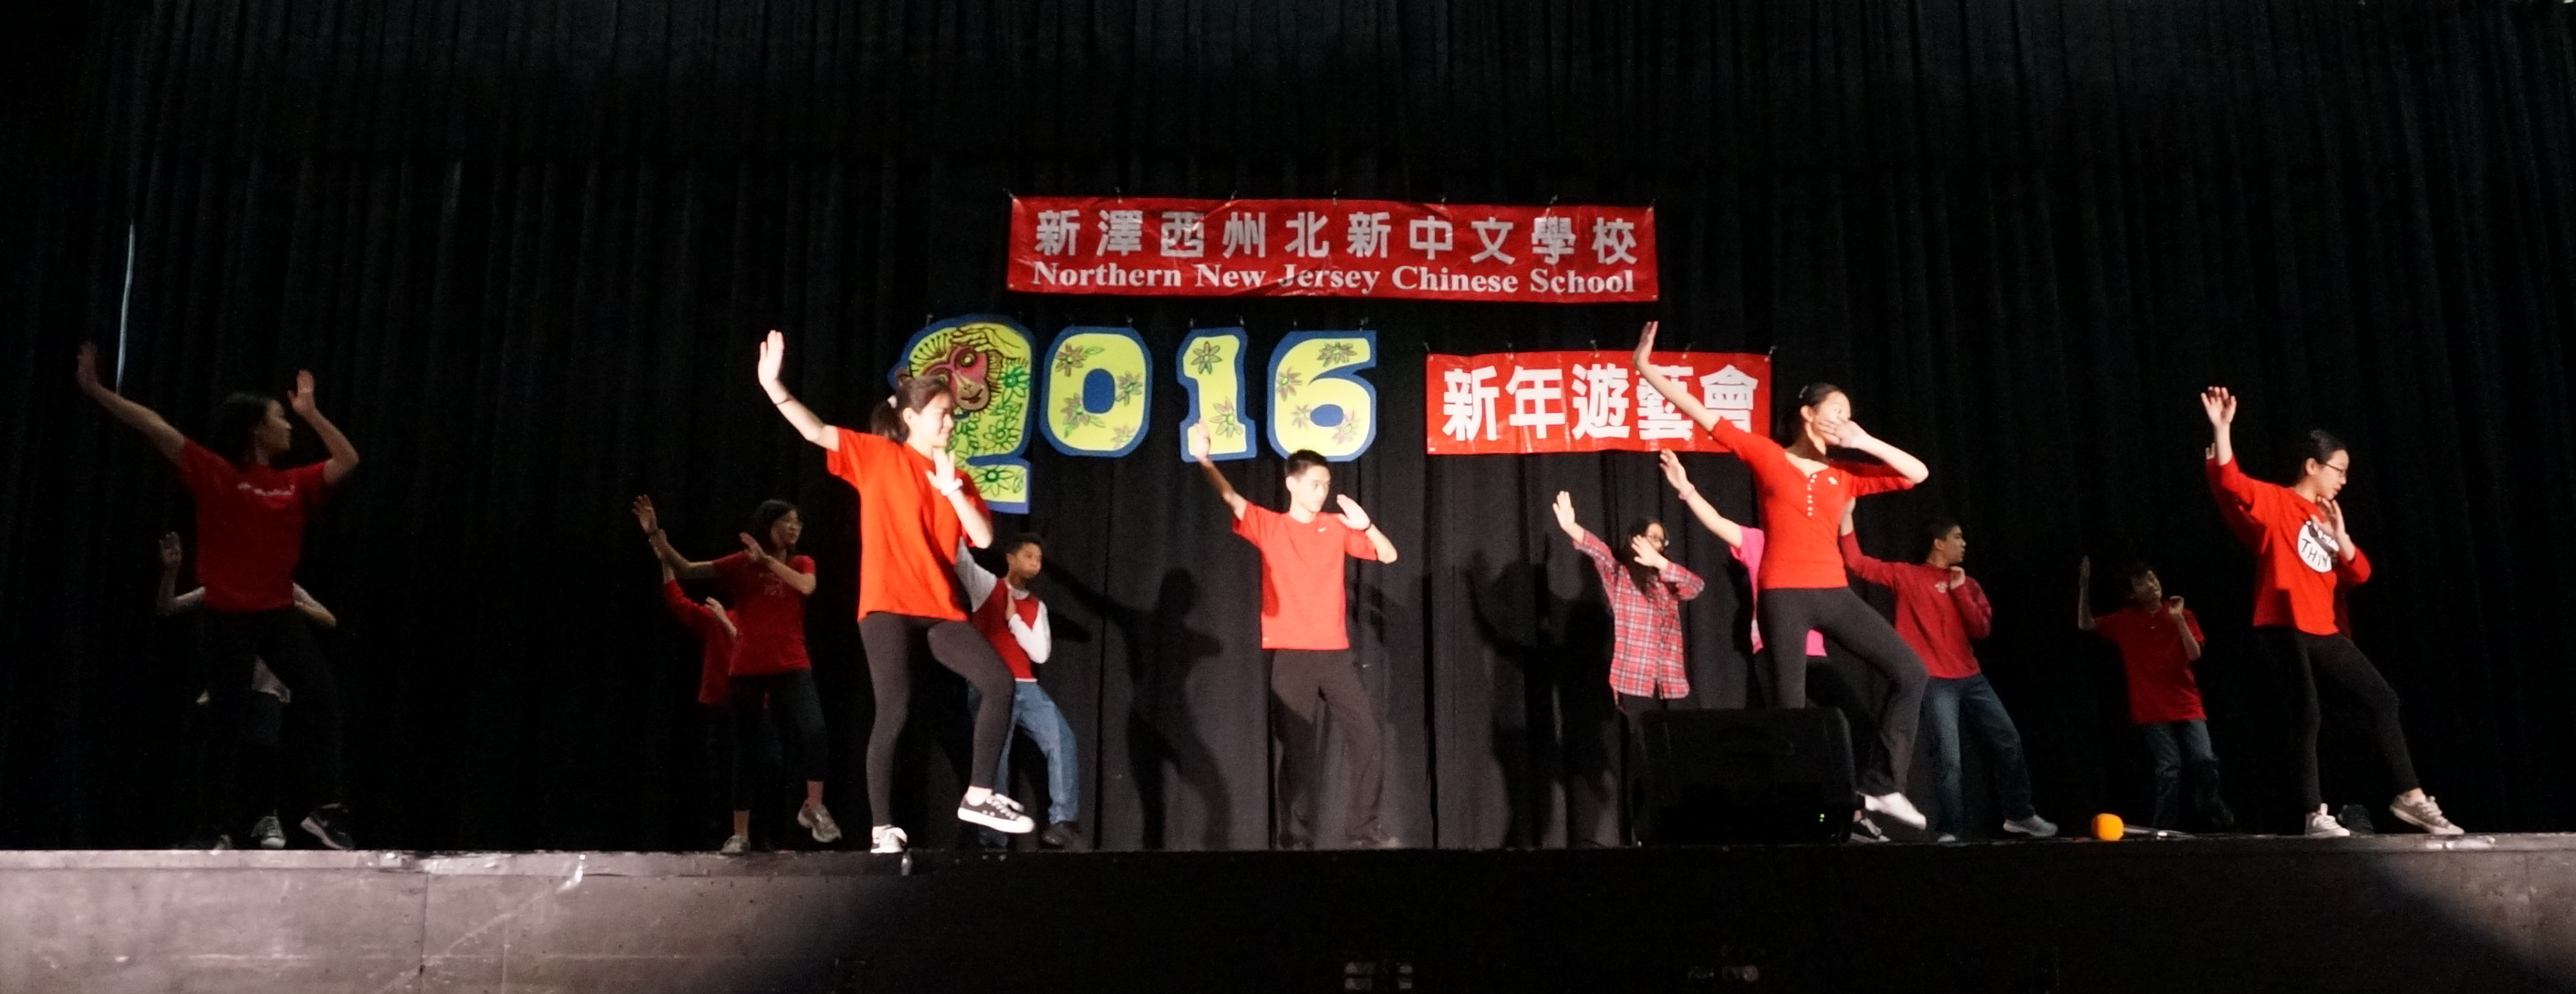 a01360e3e2ac7f634aa9_aaa_Chinese_New_Year_pix_264.JPG